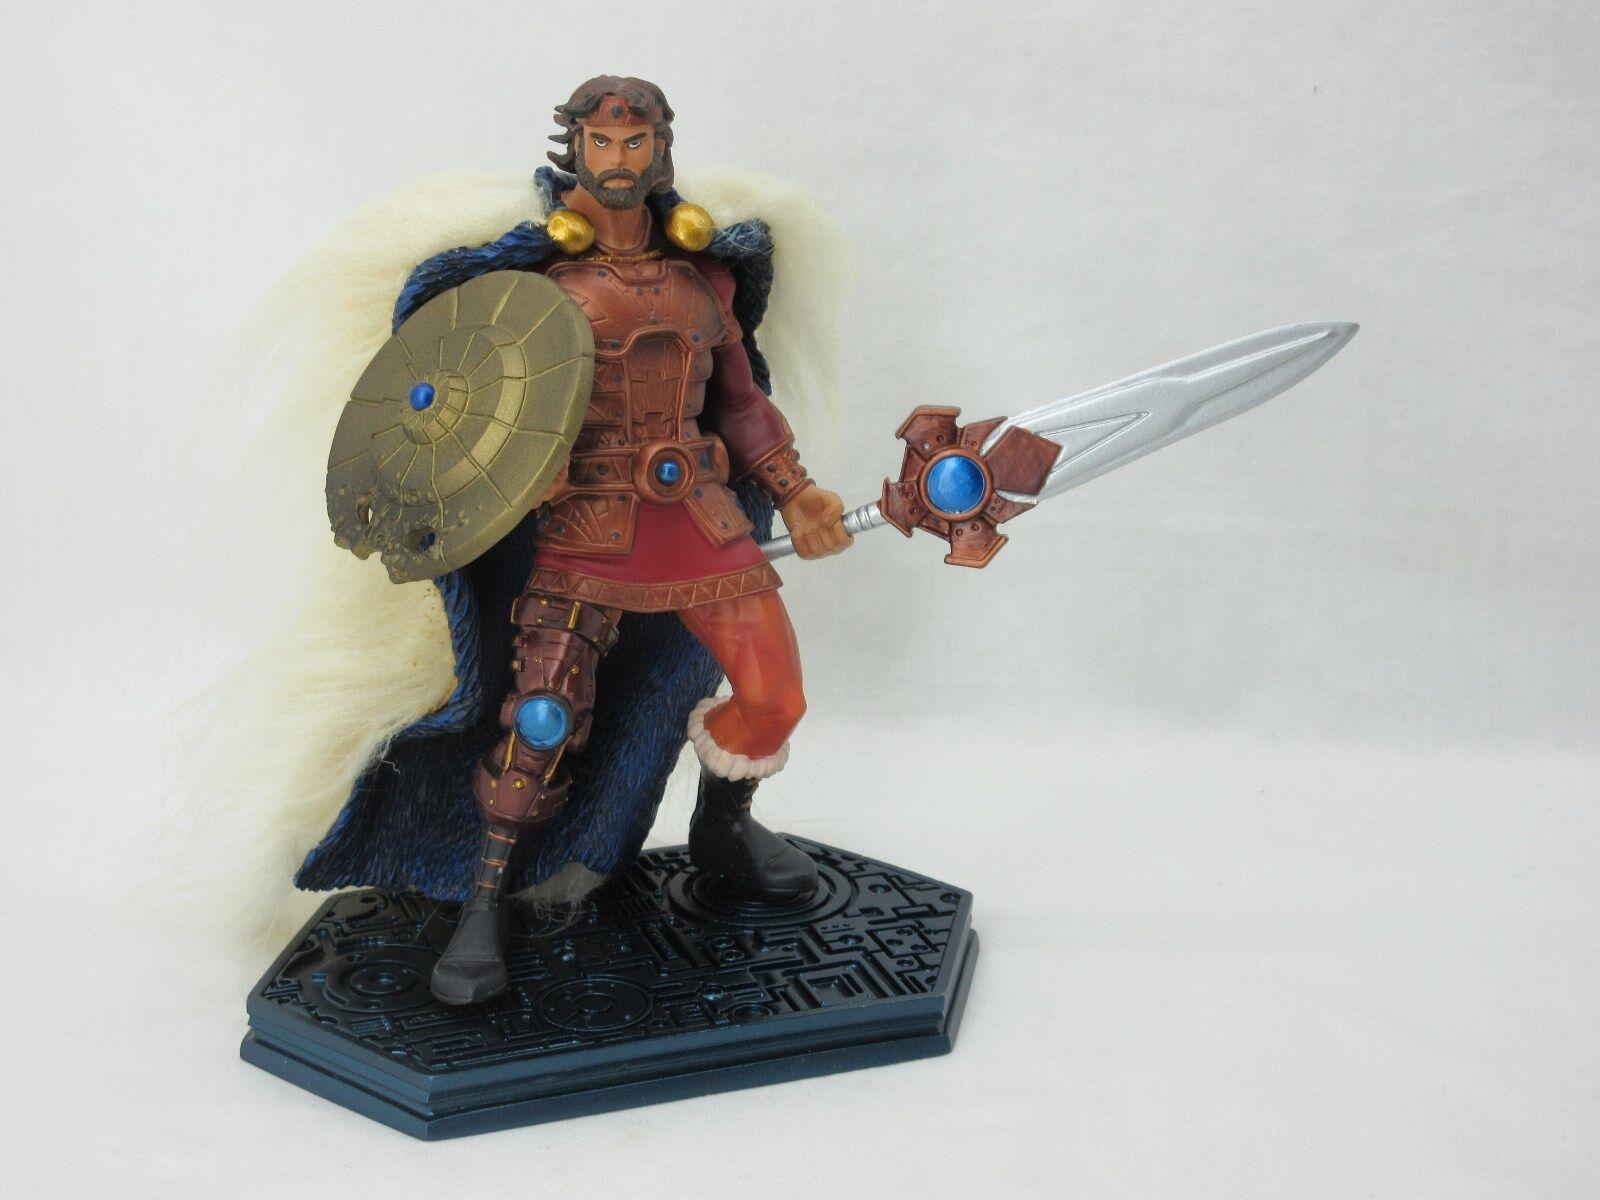 MOTU,KING RANDOR,200x,Neca,MINT,100% Complete,Masters of the Universe,He man